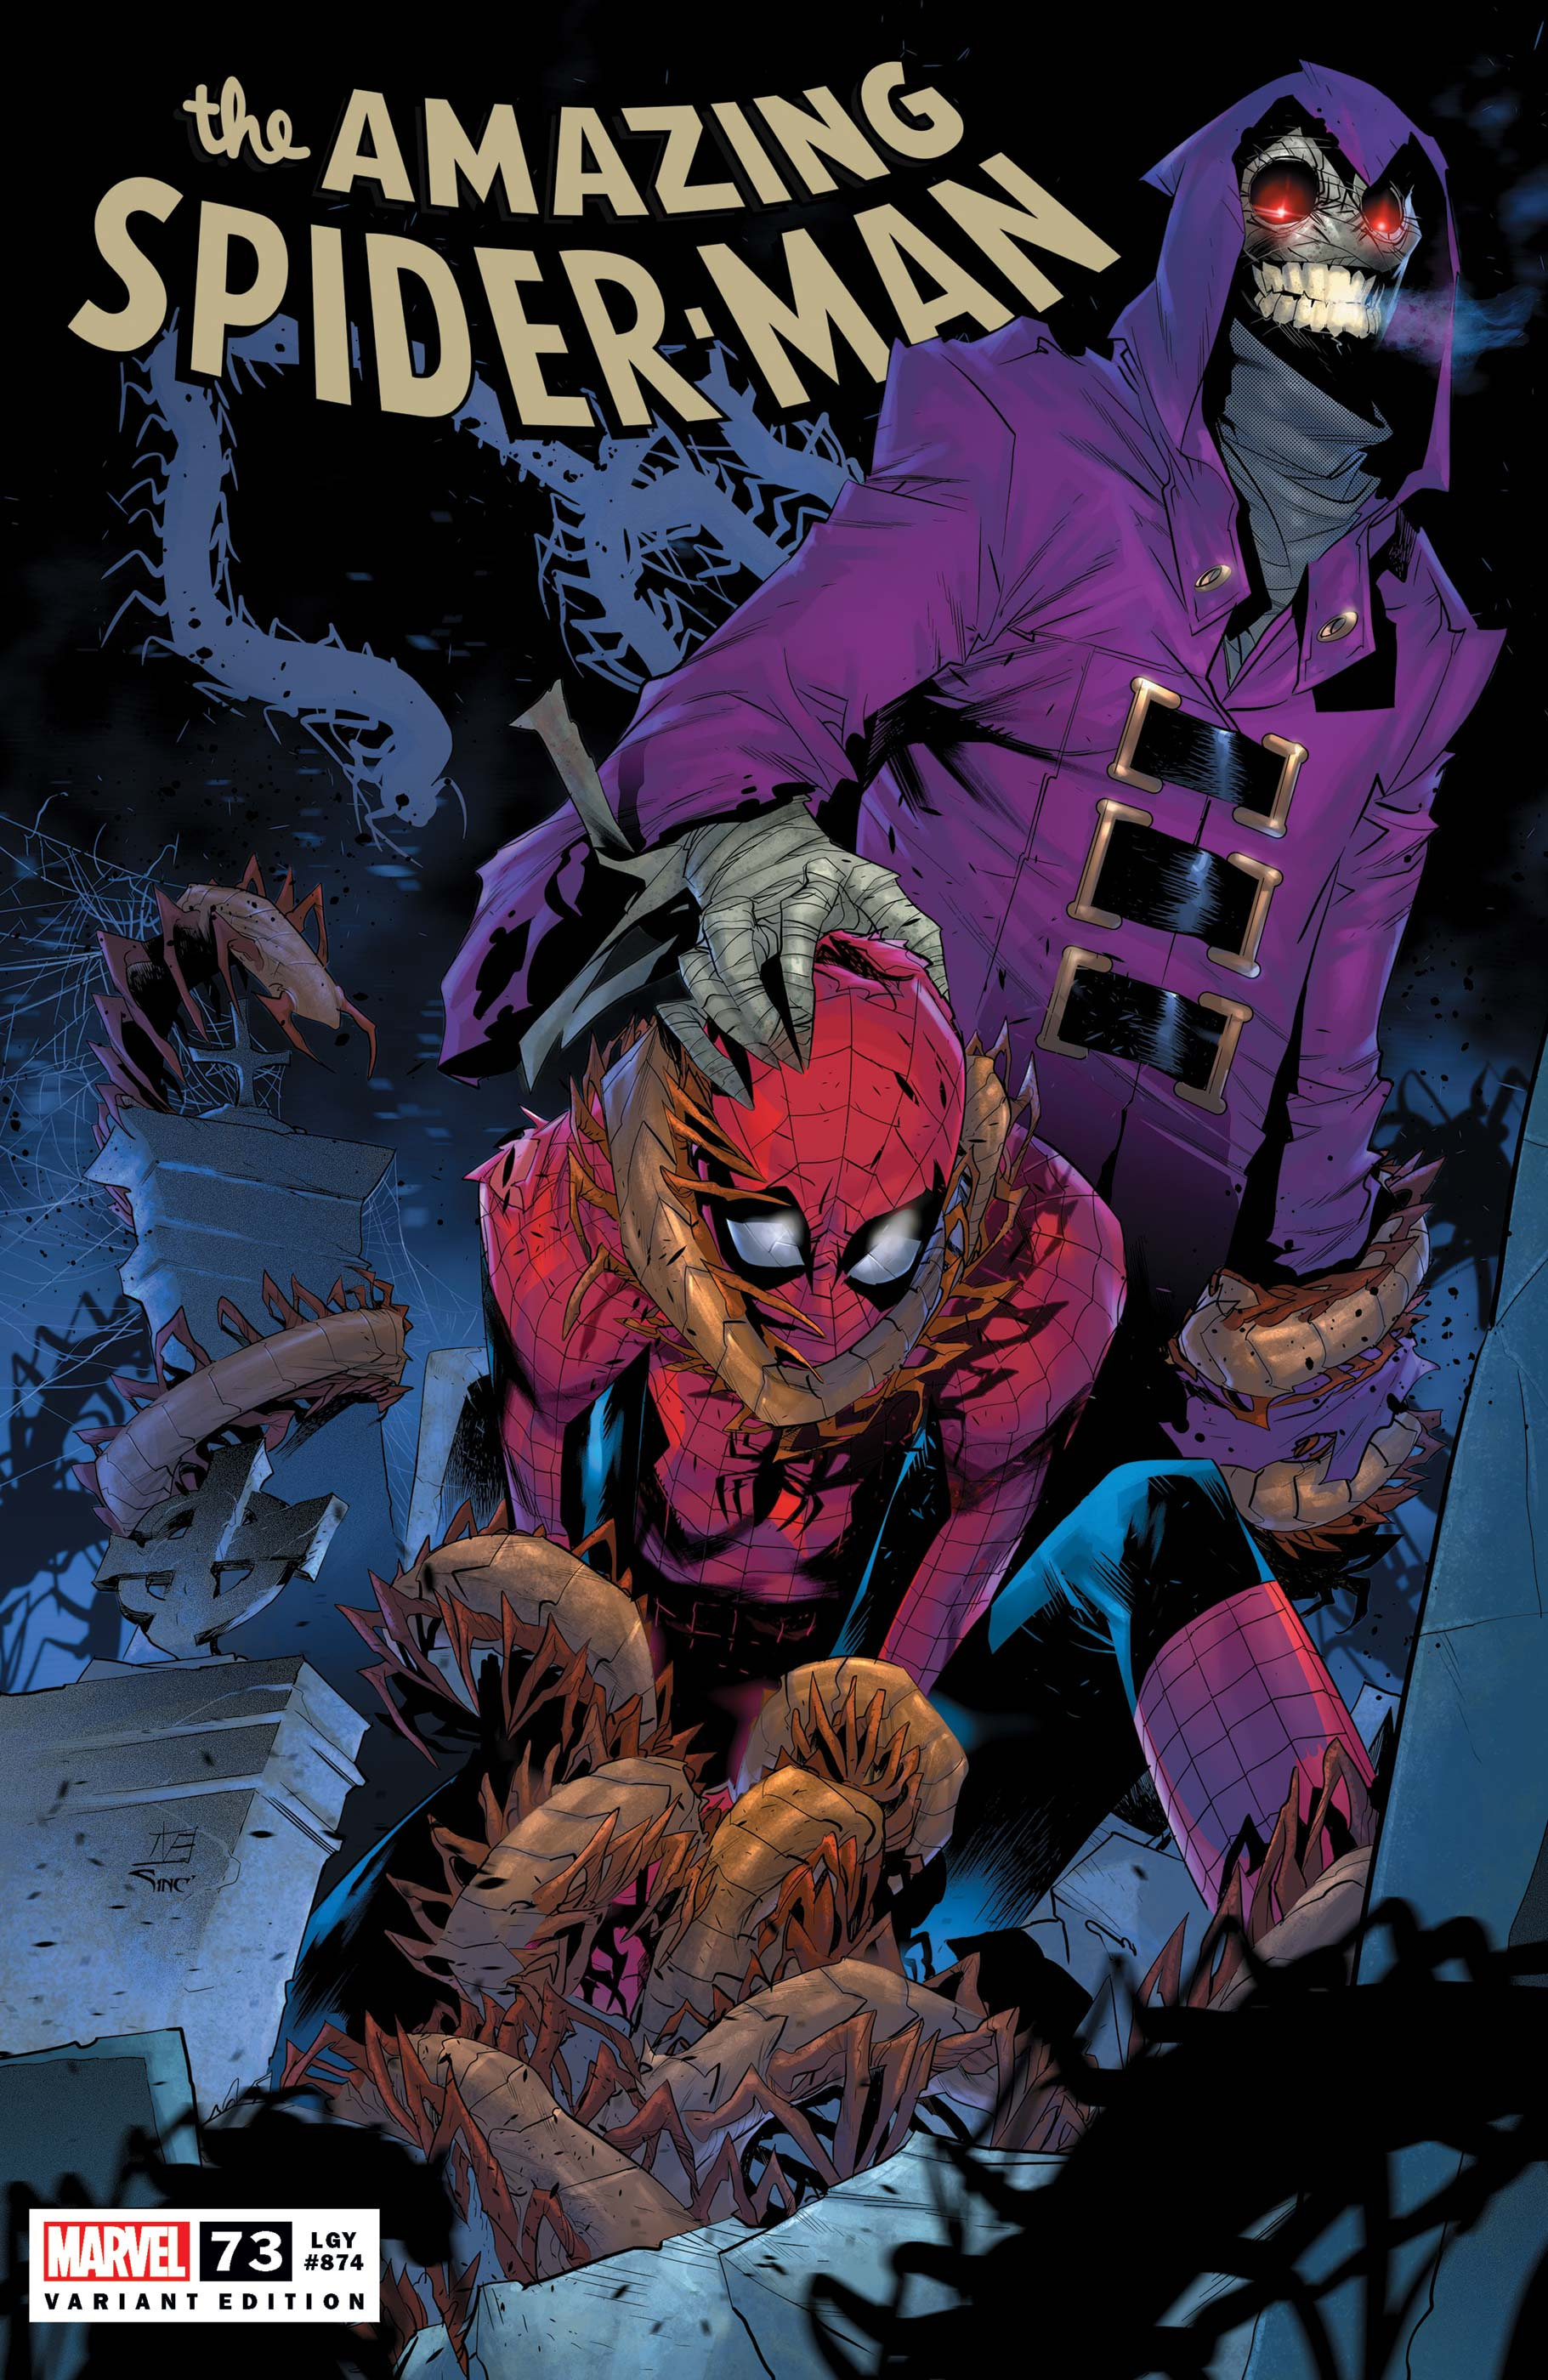 The Amazing Spider-Man (2018) #73 (Variant)